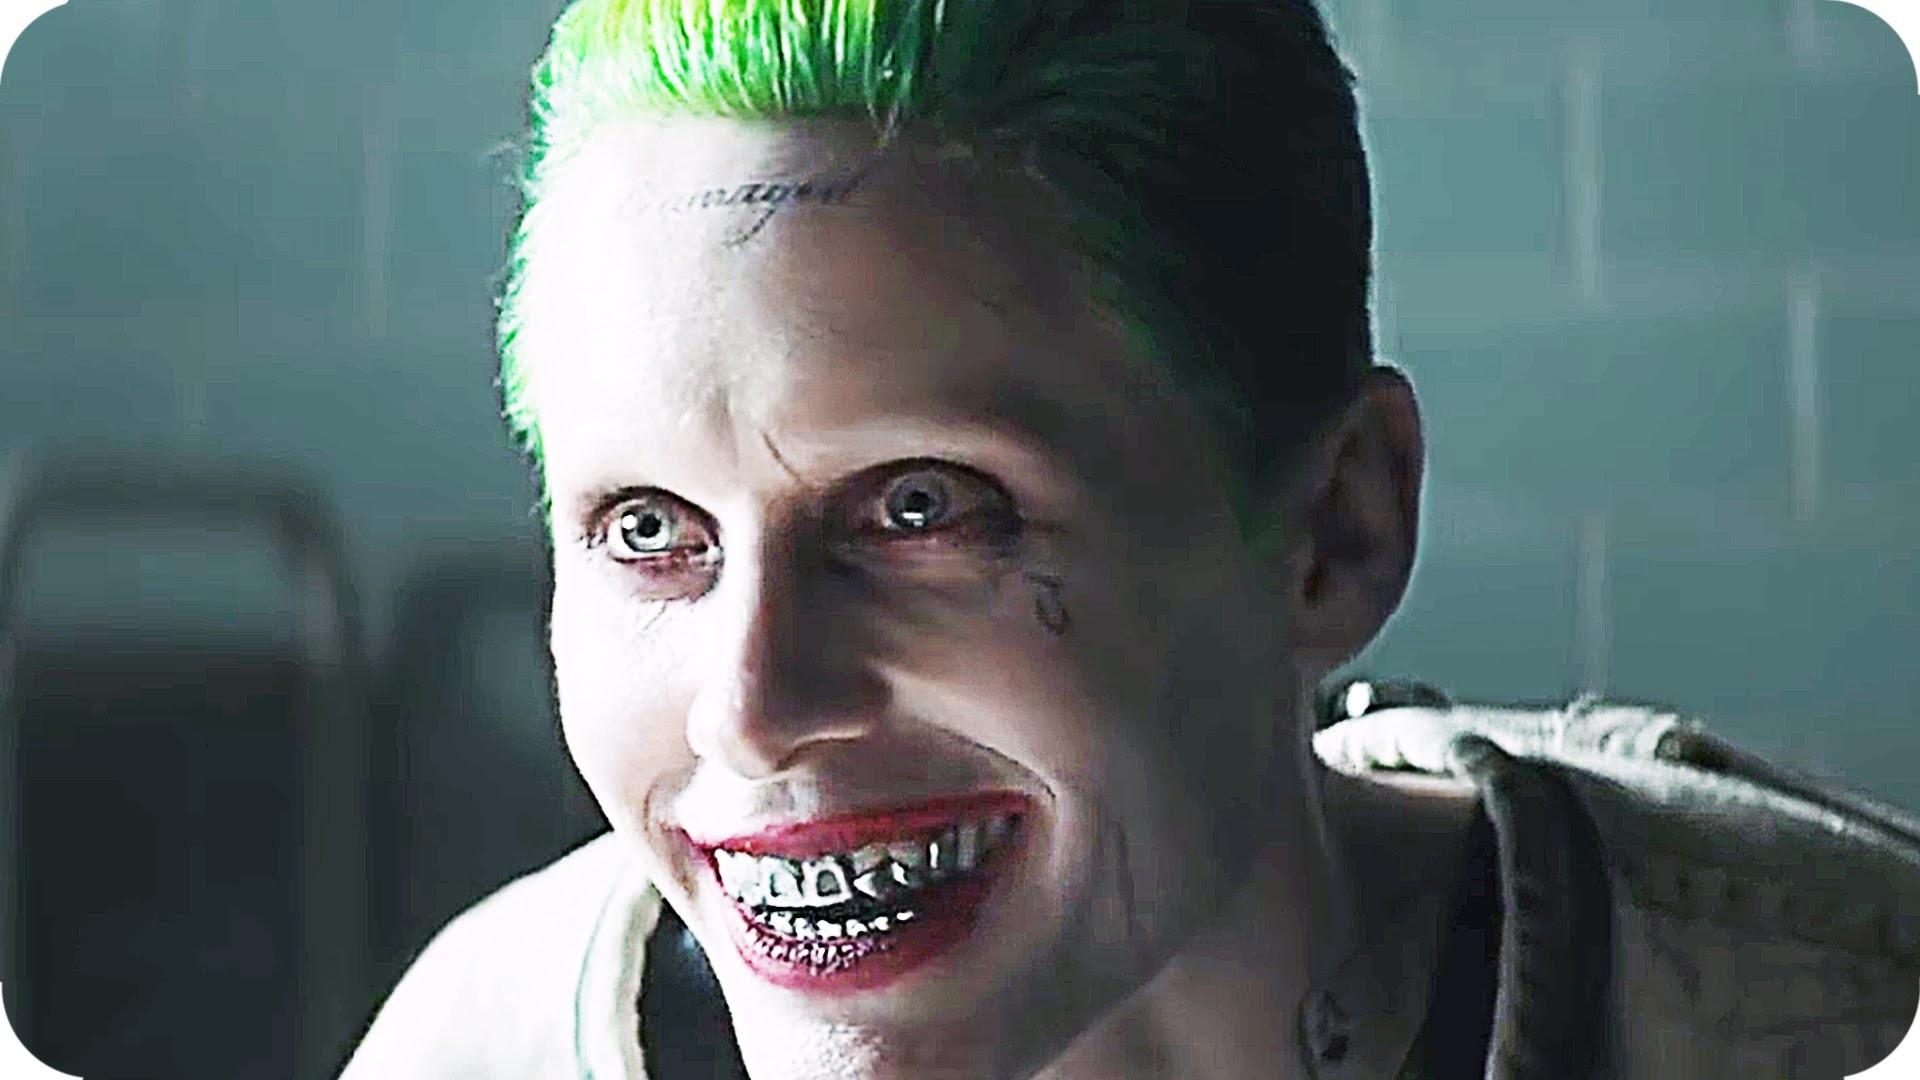 SUICIDE SQUAD Joker & Harley Quinn Trailer (2016) Jared Leto, Margot Robbie  Movie – YouTube